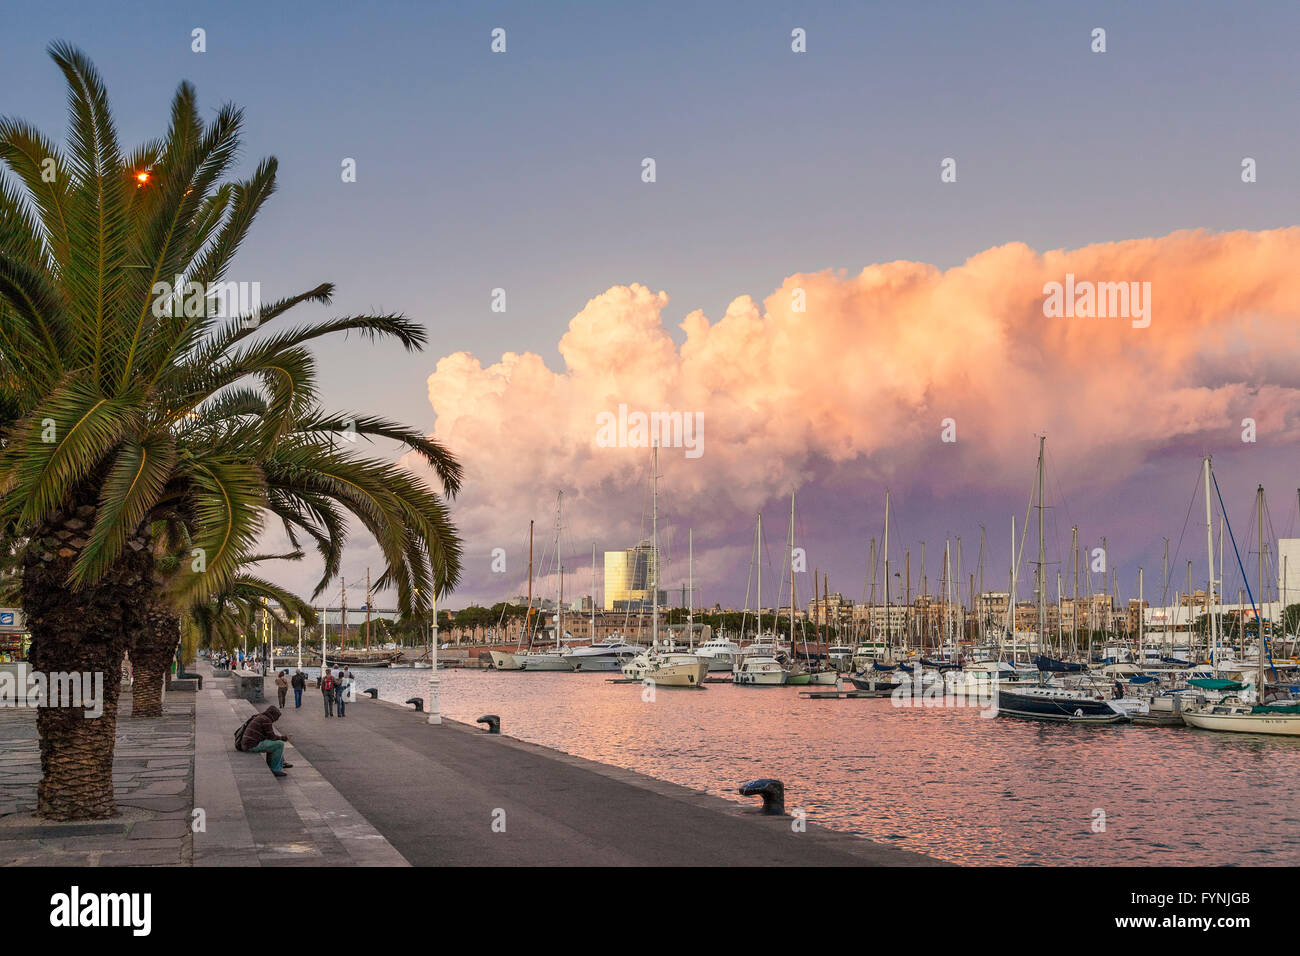 Promenade, Boats, Port Vell, Sunset,  Barcelona, Catalonia, Spain - Stock Image